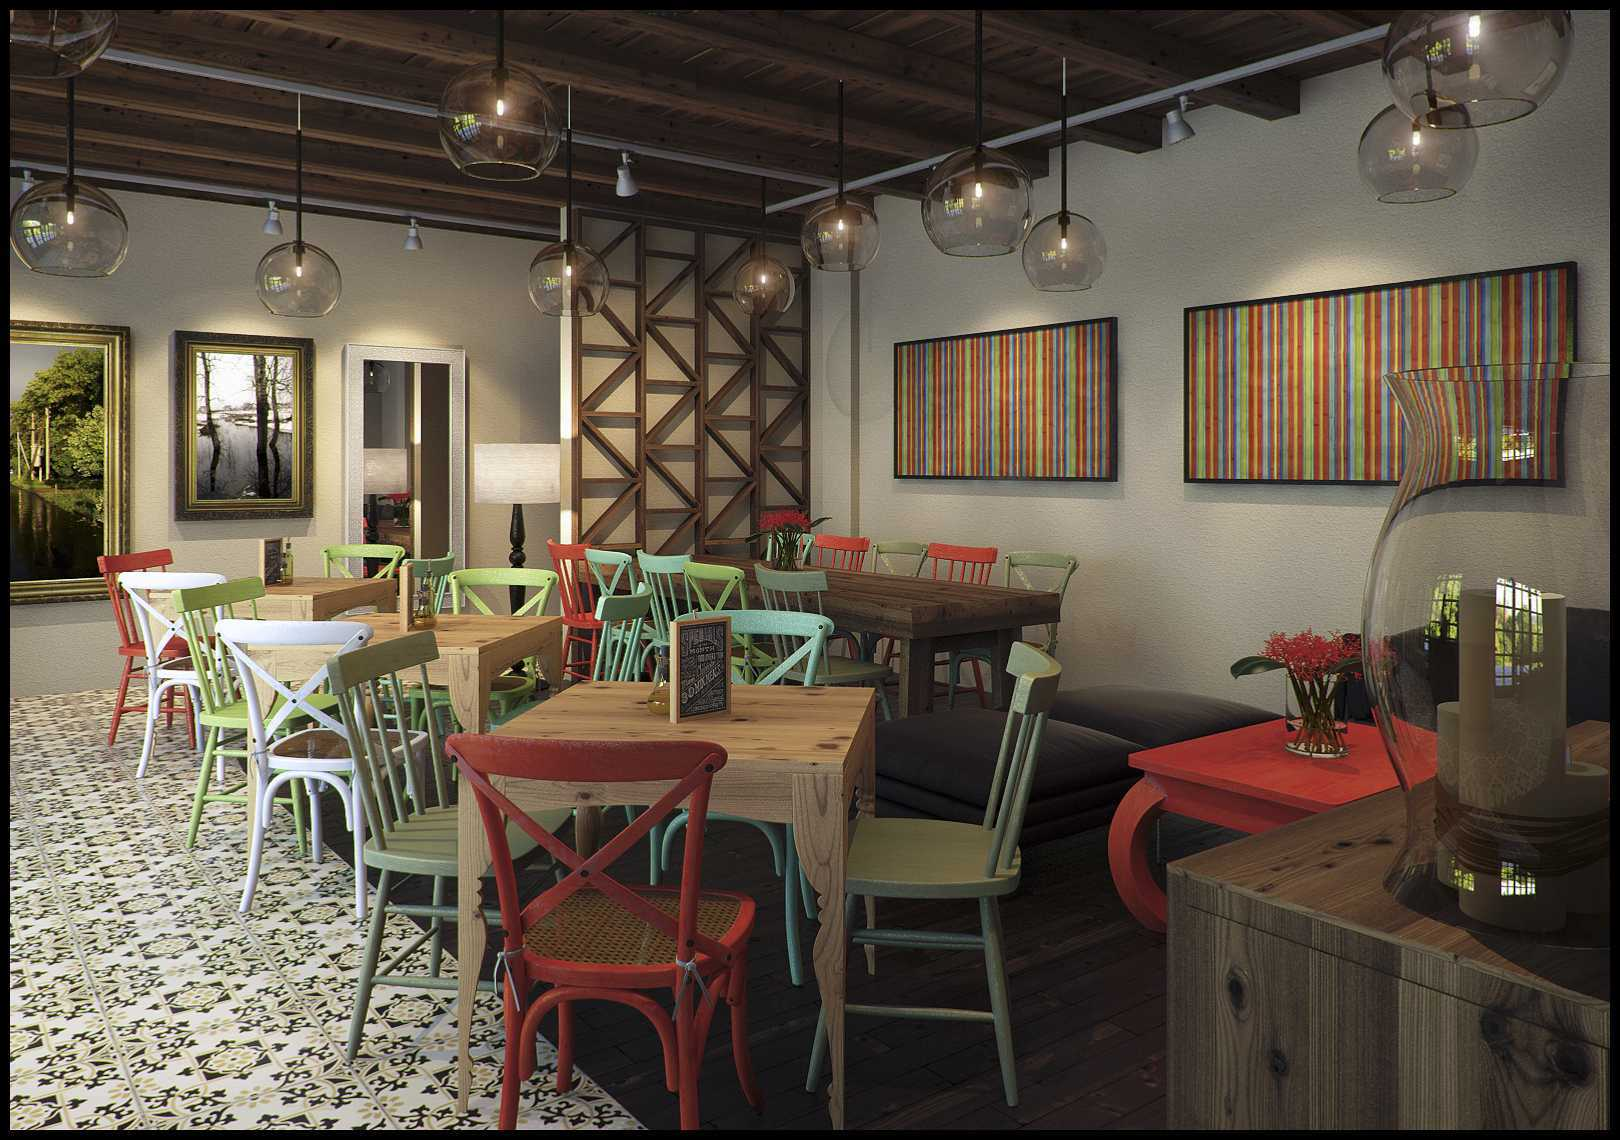 Design Archade Basilia Cafe Semarang, Kota Semarang, Jawa Tengah, Indonesia Semarang, Kota Semarang, Jawa Tengah, Indonesia Seating Area Restaurant Kontemporer  43567